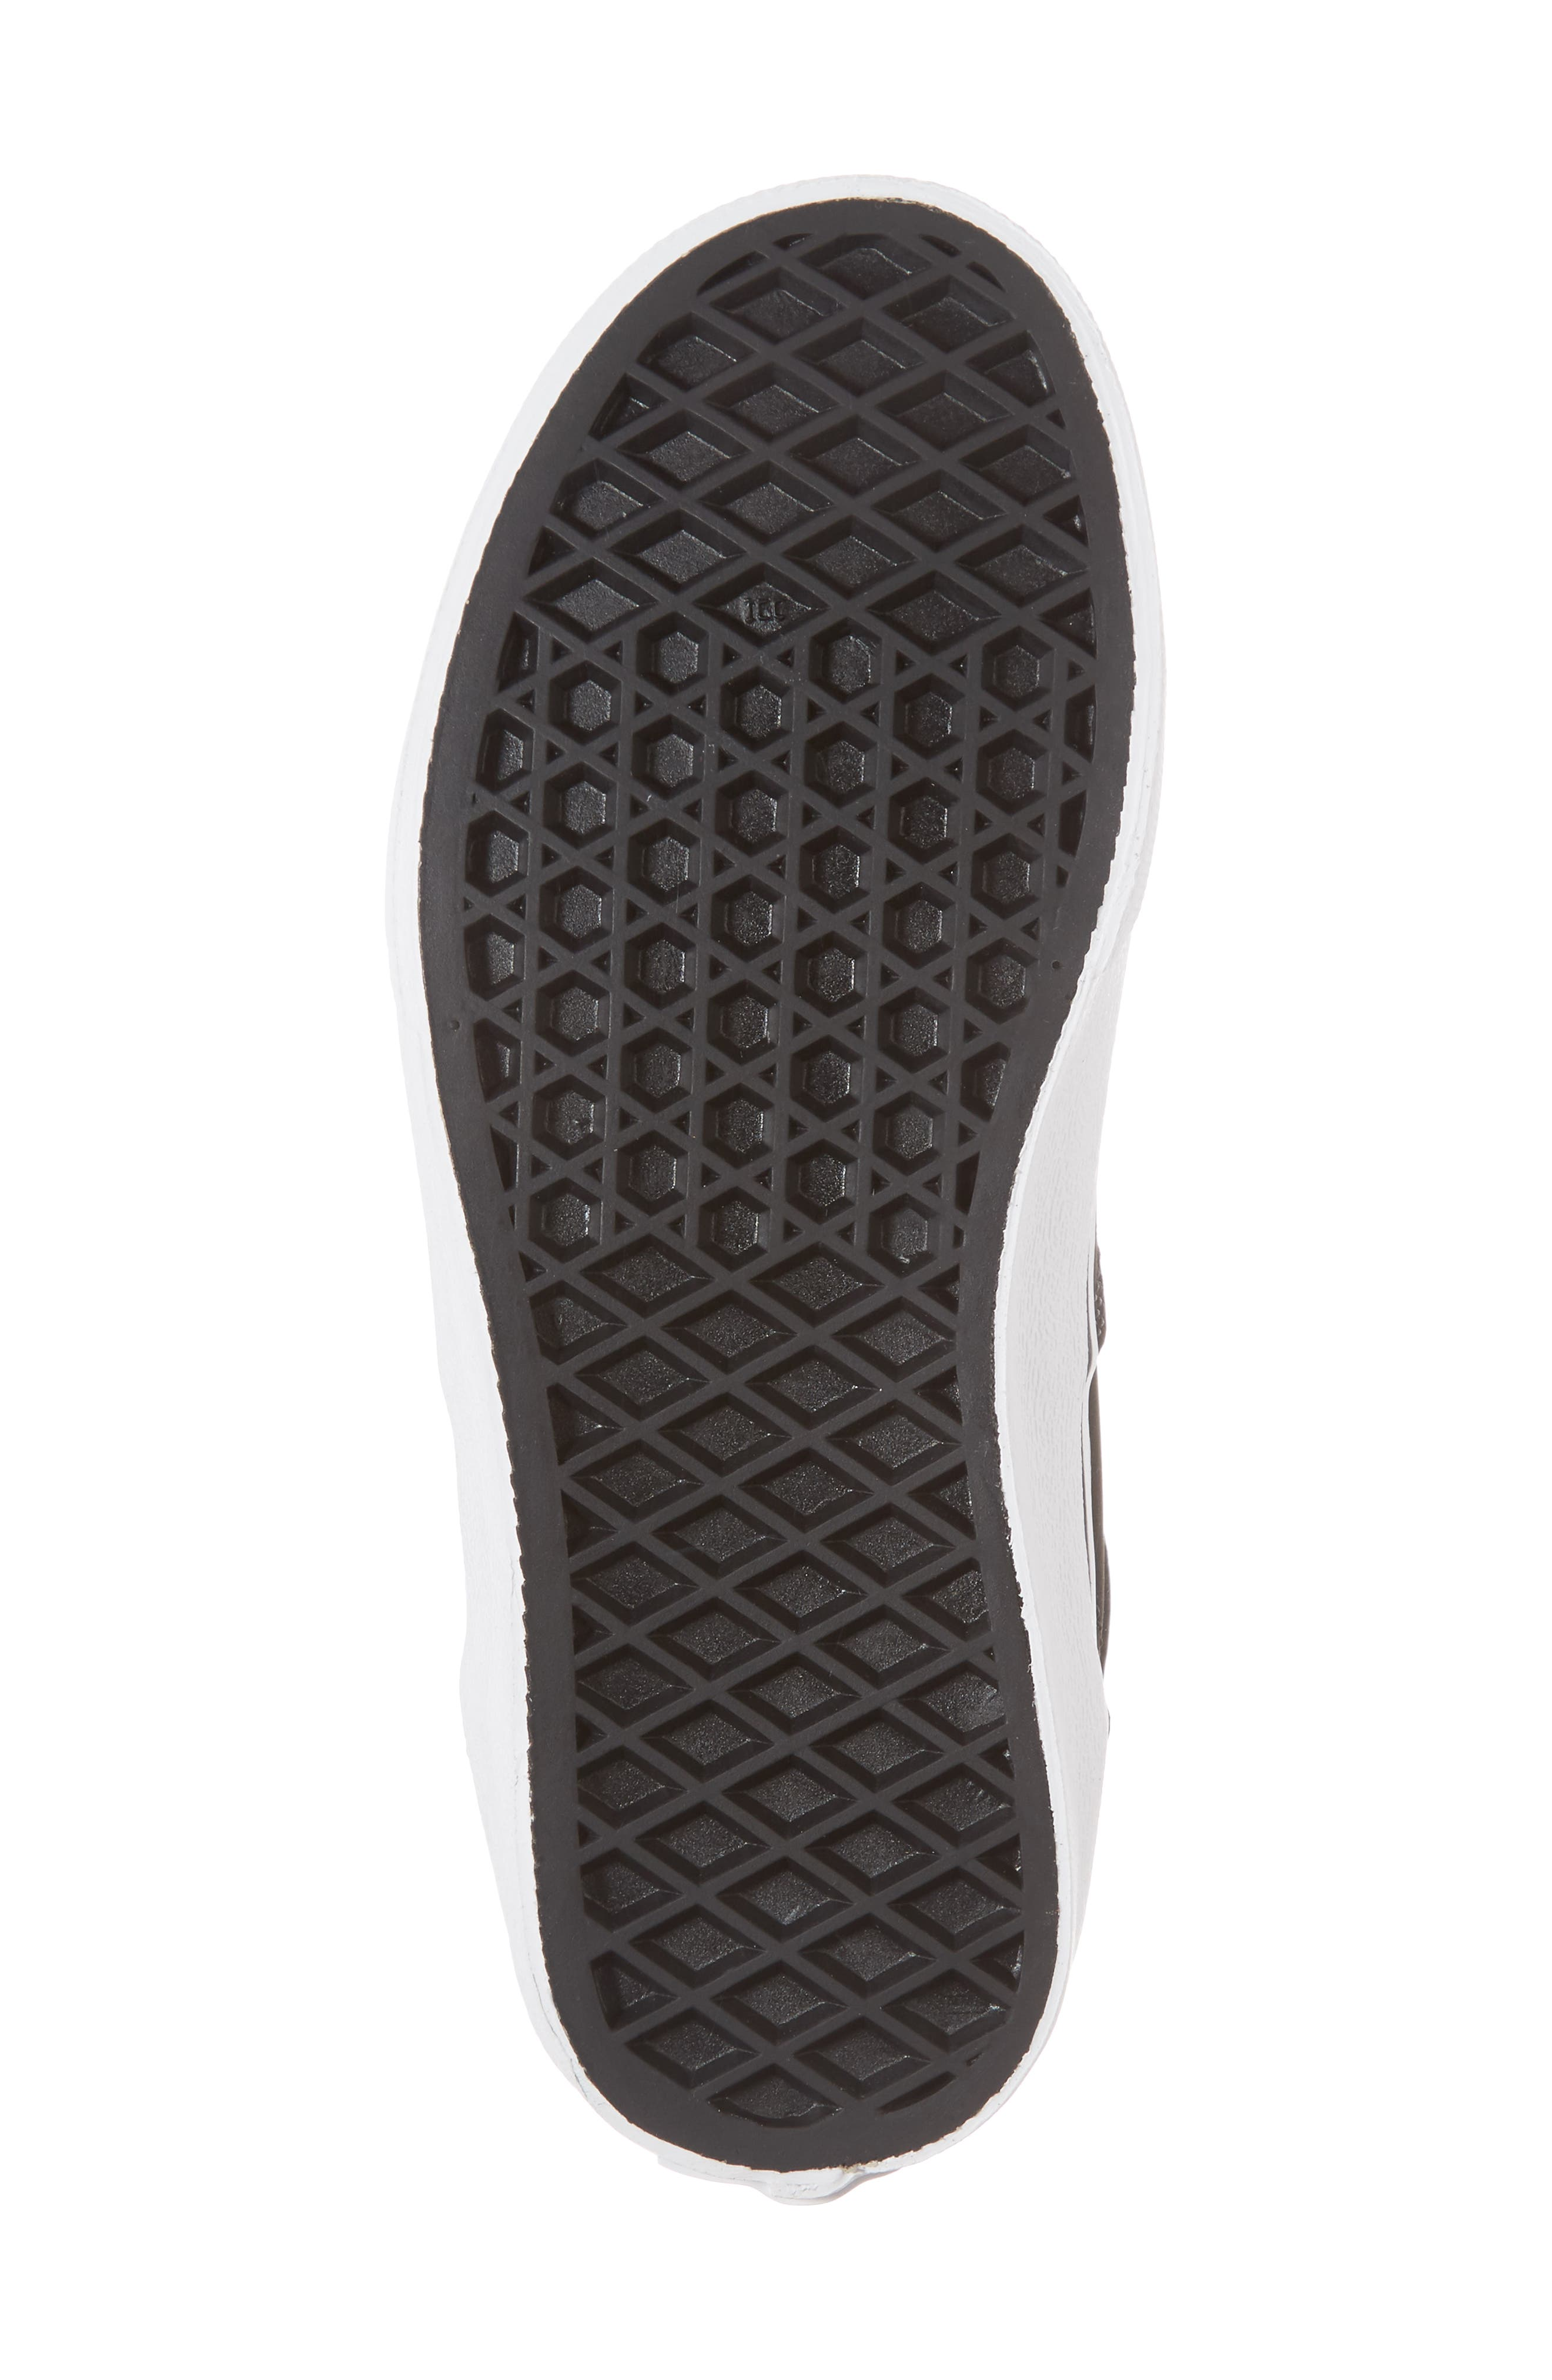 Era - Hi Sneaker,                             Alternate thumbnail 6, color,                             Vansbuck Black/ Cathay Spice